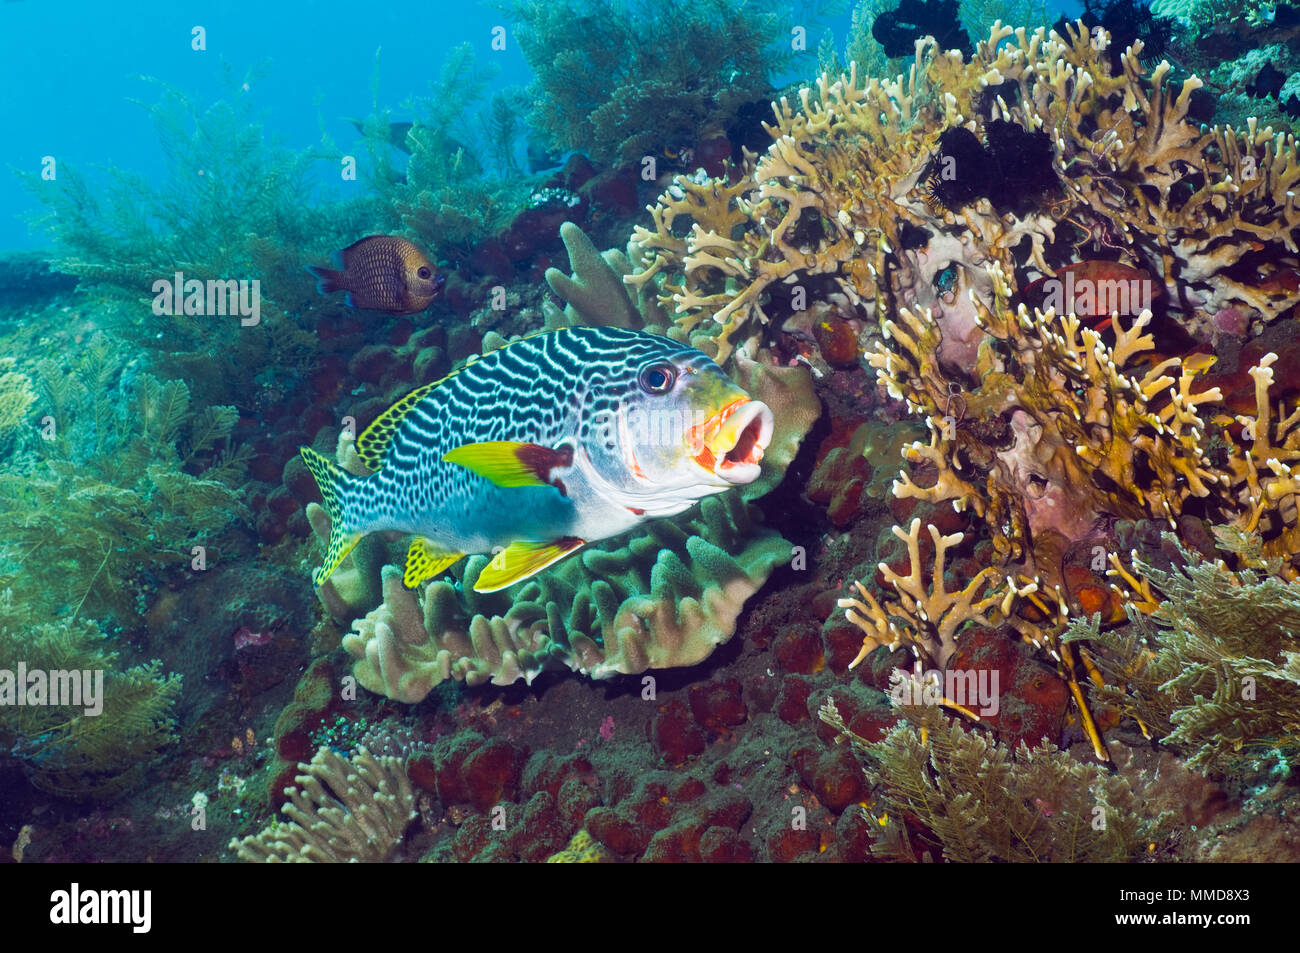 Lined sweetlips (Plectorhinchus lineatus).  Bali, Indonesia.  (Digital capture). - Stock Image